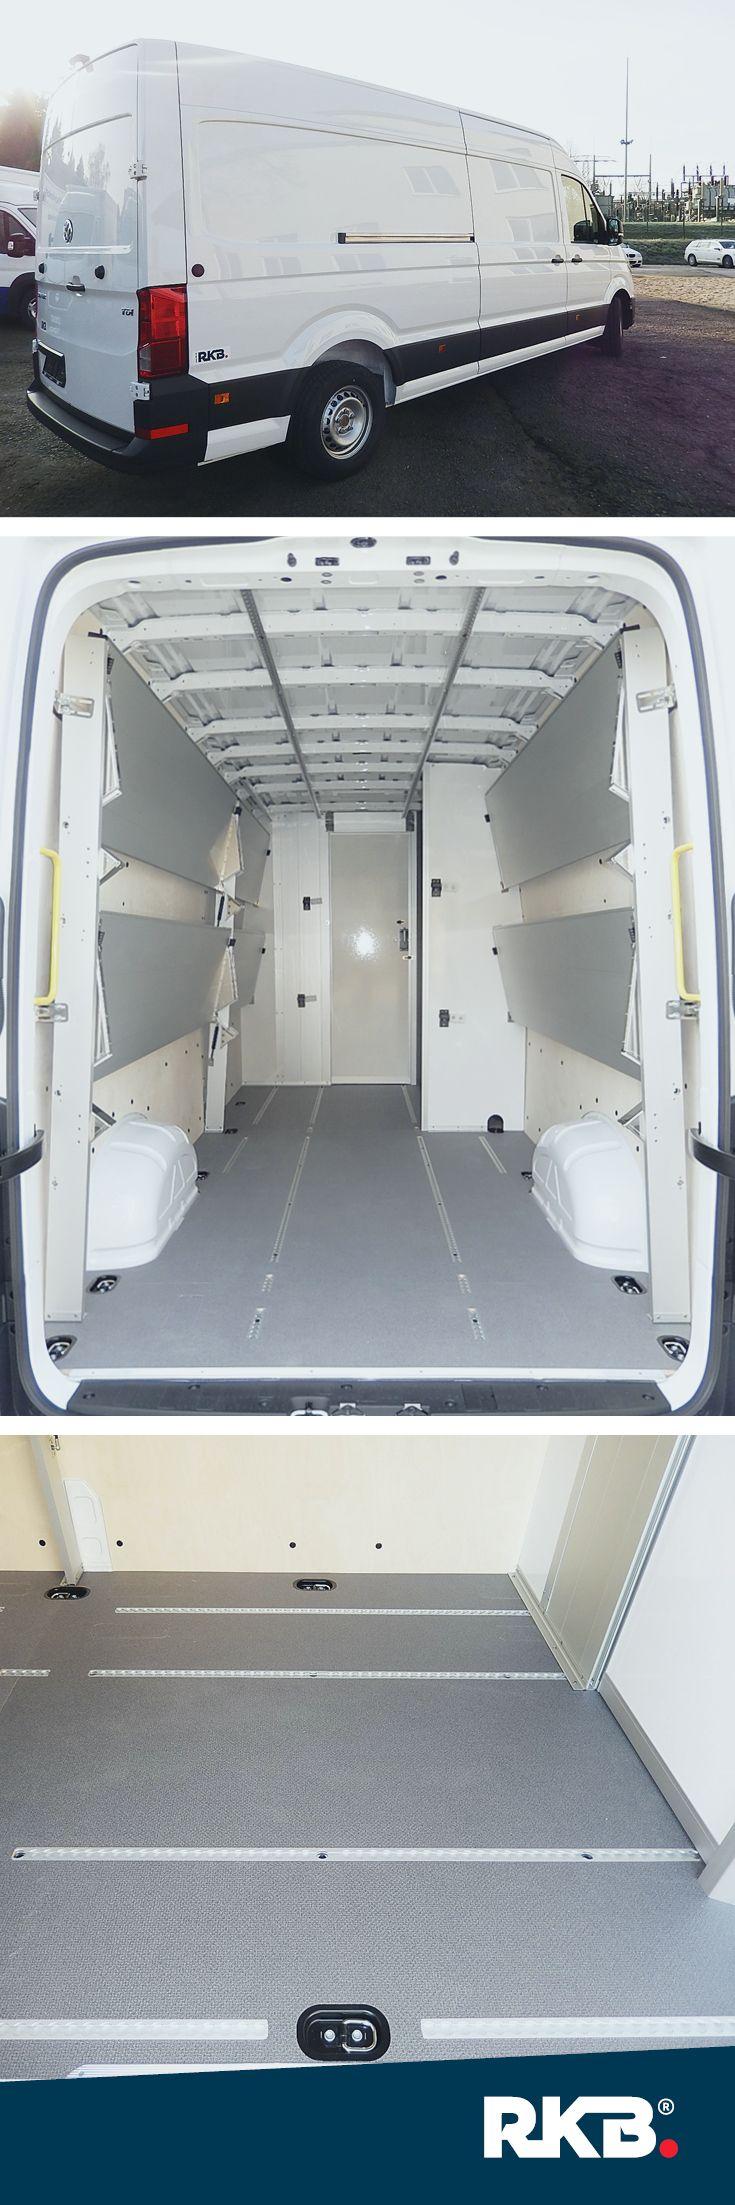 VW-Kastenwagenausbau von RKB #RKB #Transportfahrzeuge #Delivery #KEP #Logistikfahrzeuge #VW #Crafter #Nutzfahrzeuge Regalsystem #Innenausbau